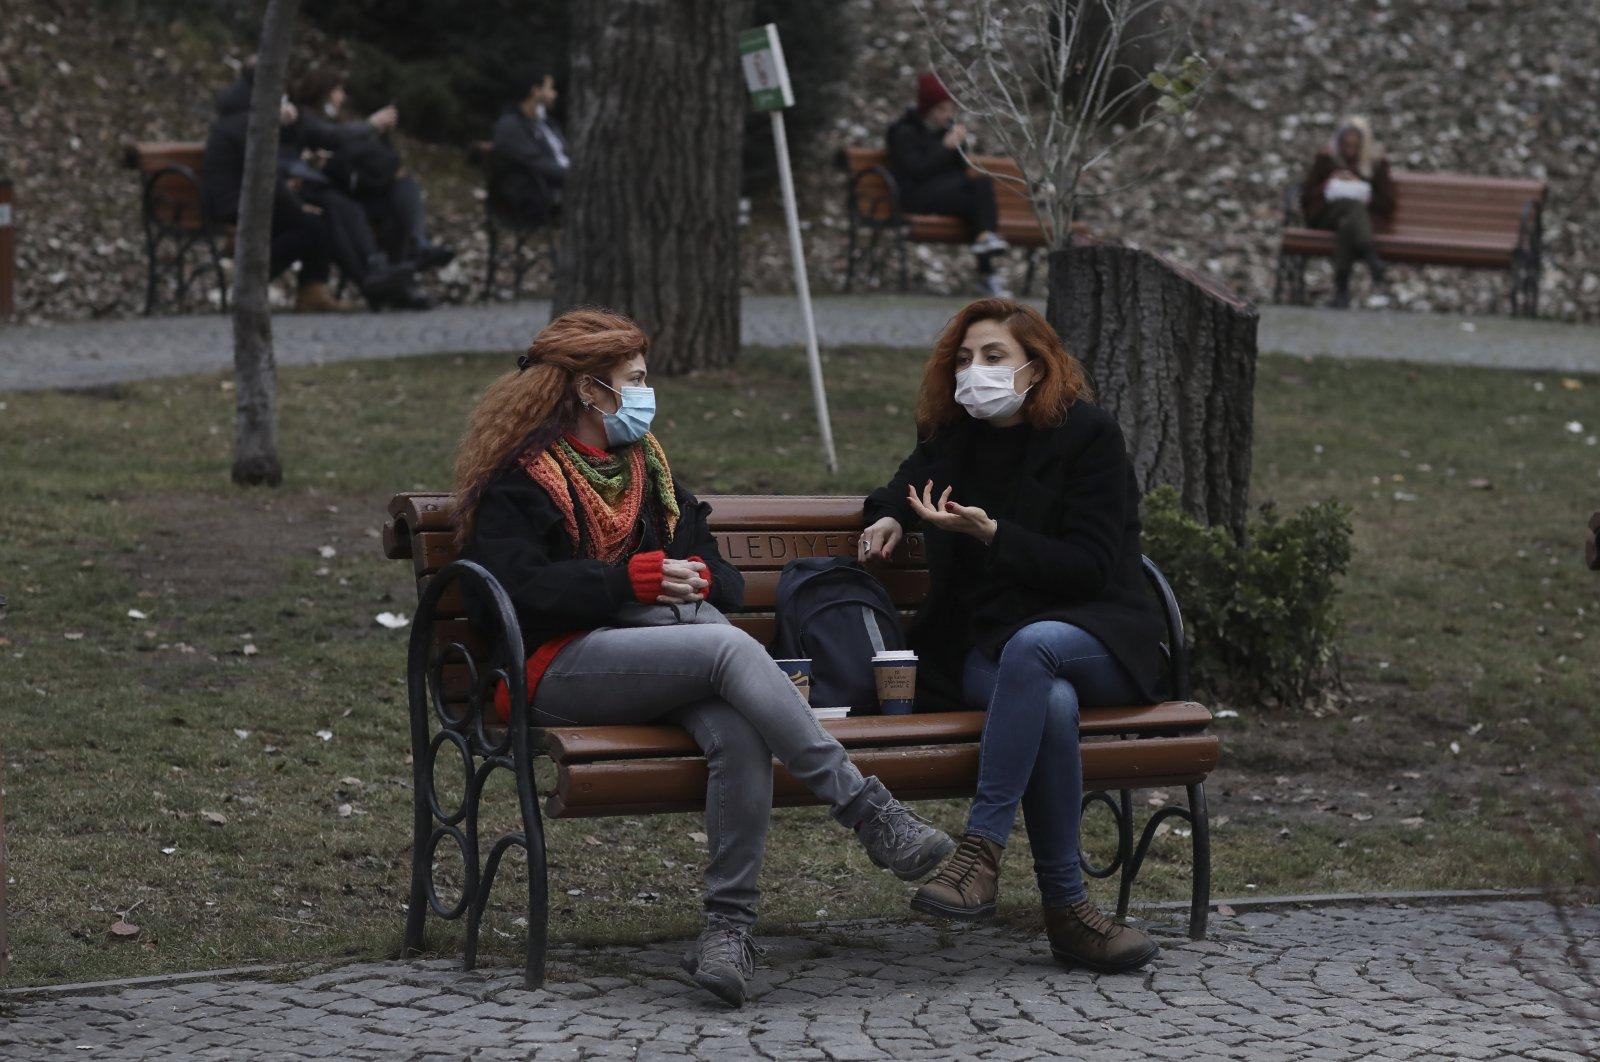 Women wearing protective masks sit in a park in the capital Ankara, Turkey, Dec. 31, 2020. (AP PHOTO)